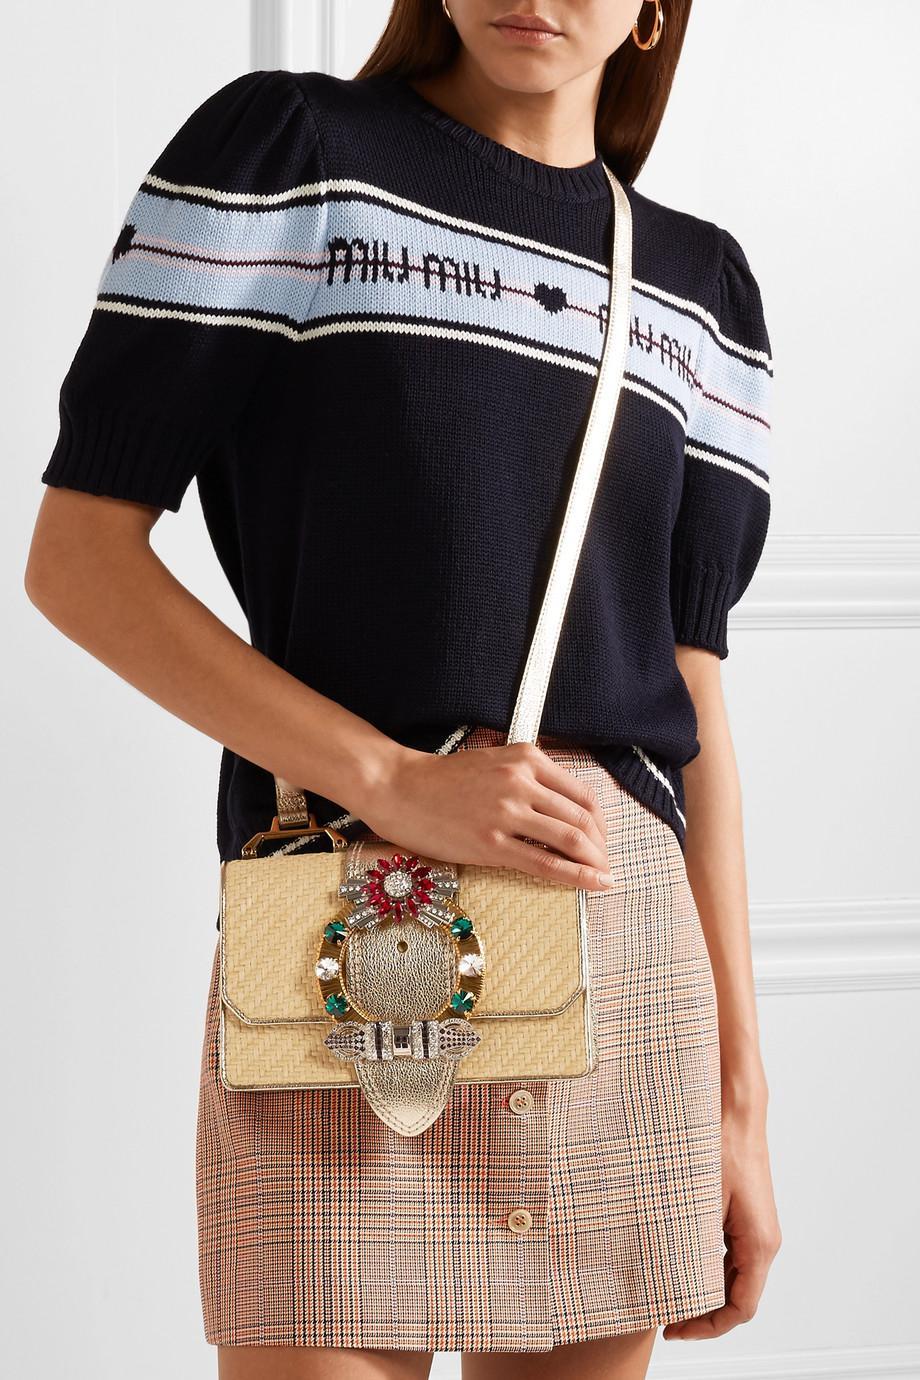 Miu Lady Embellished Raffia And Textured-leather Shoulder Bag - Gold Miu Miu 72xaGI00bY